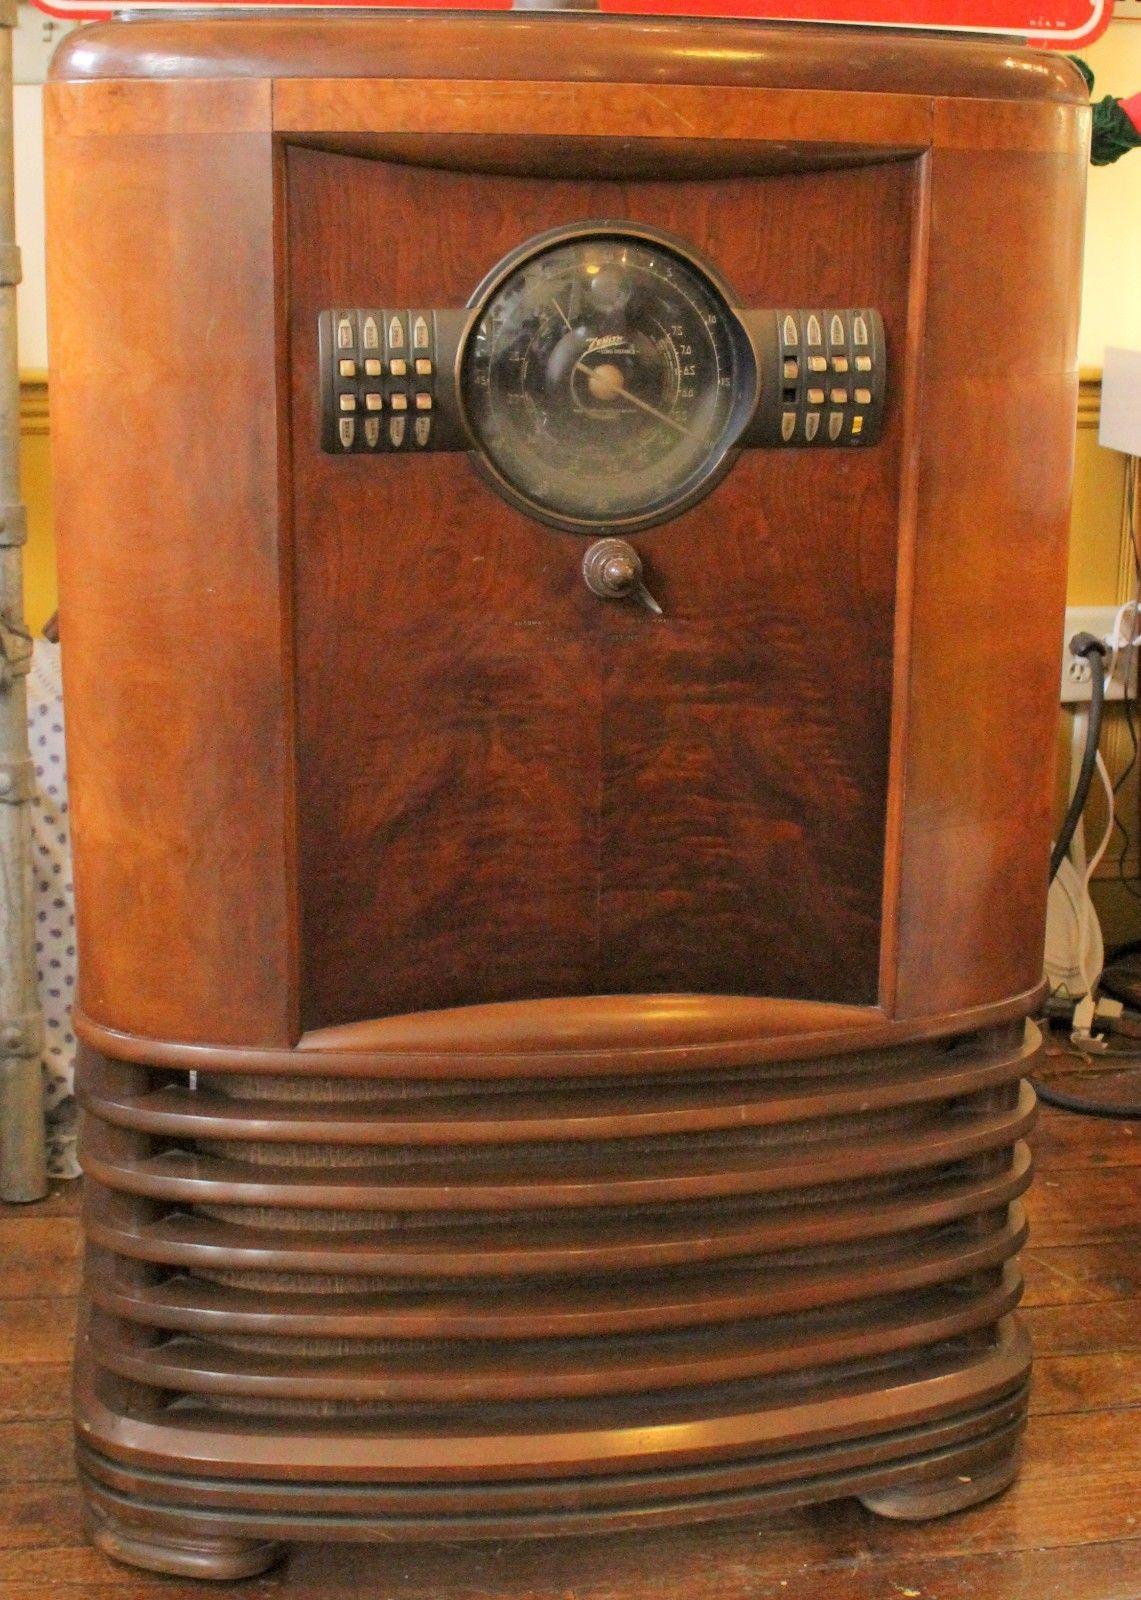 Zenith Shutter Dial Console Radio Model 9 S 367 Vintage 1930 039 S Ebay Antique Radio Vintage Radio Old Radios